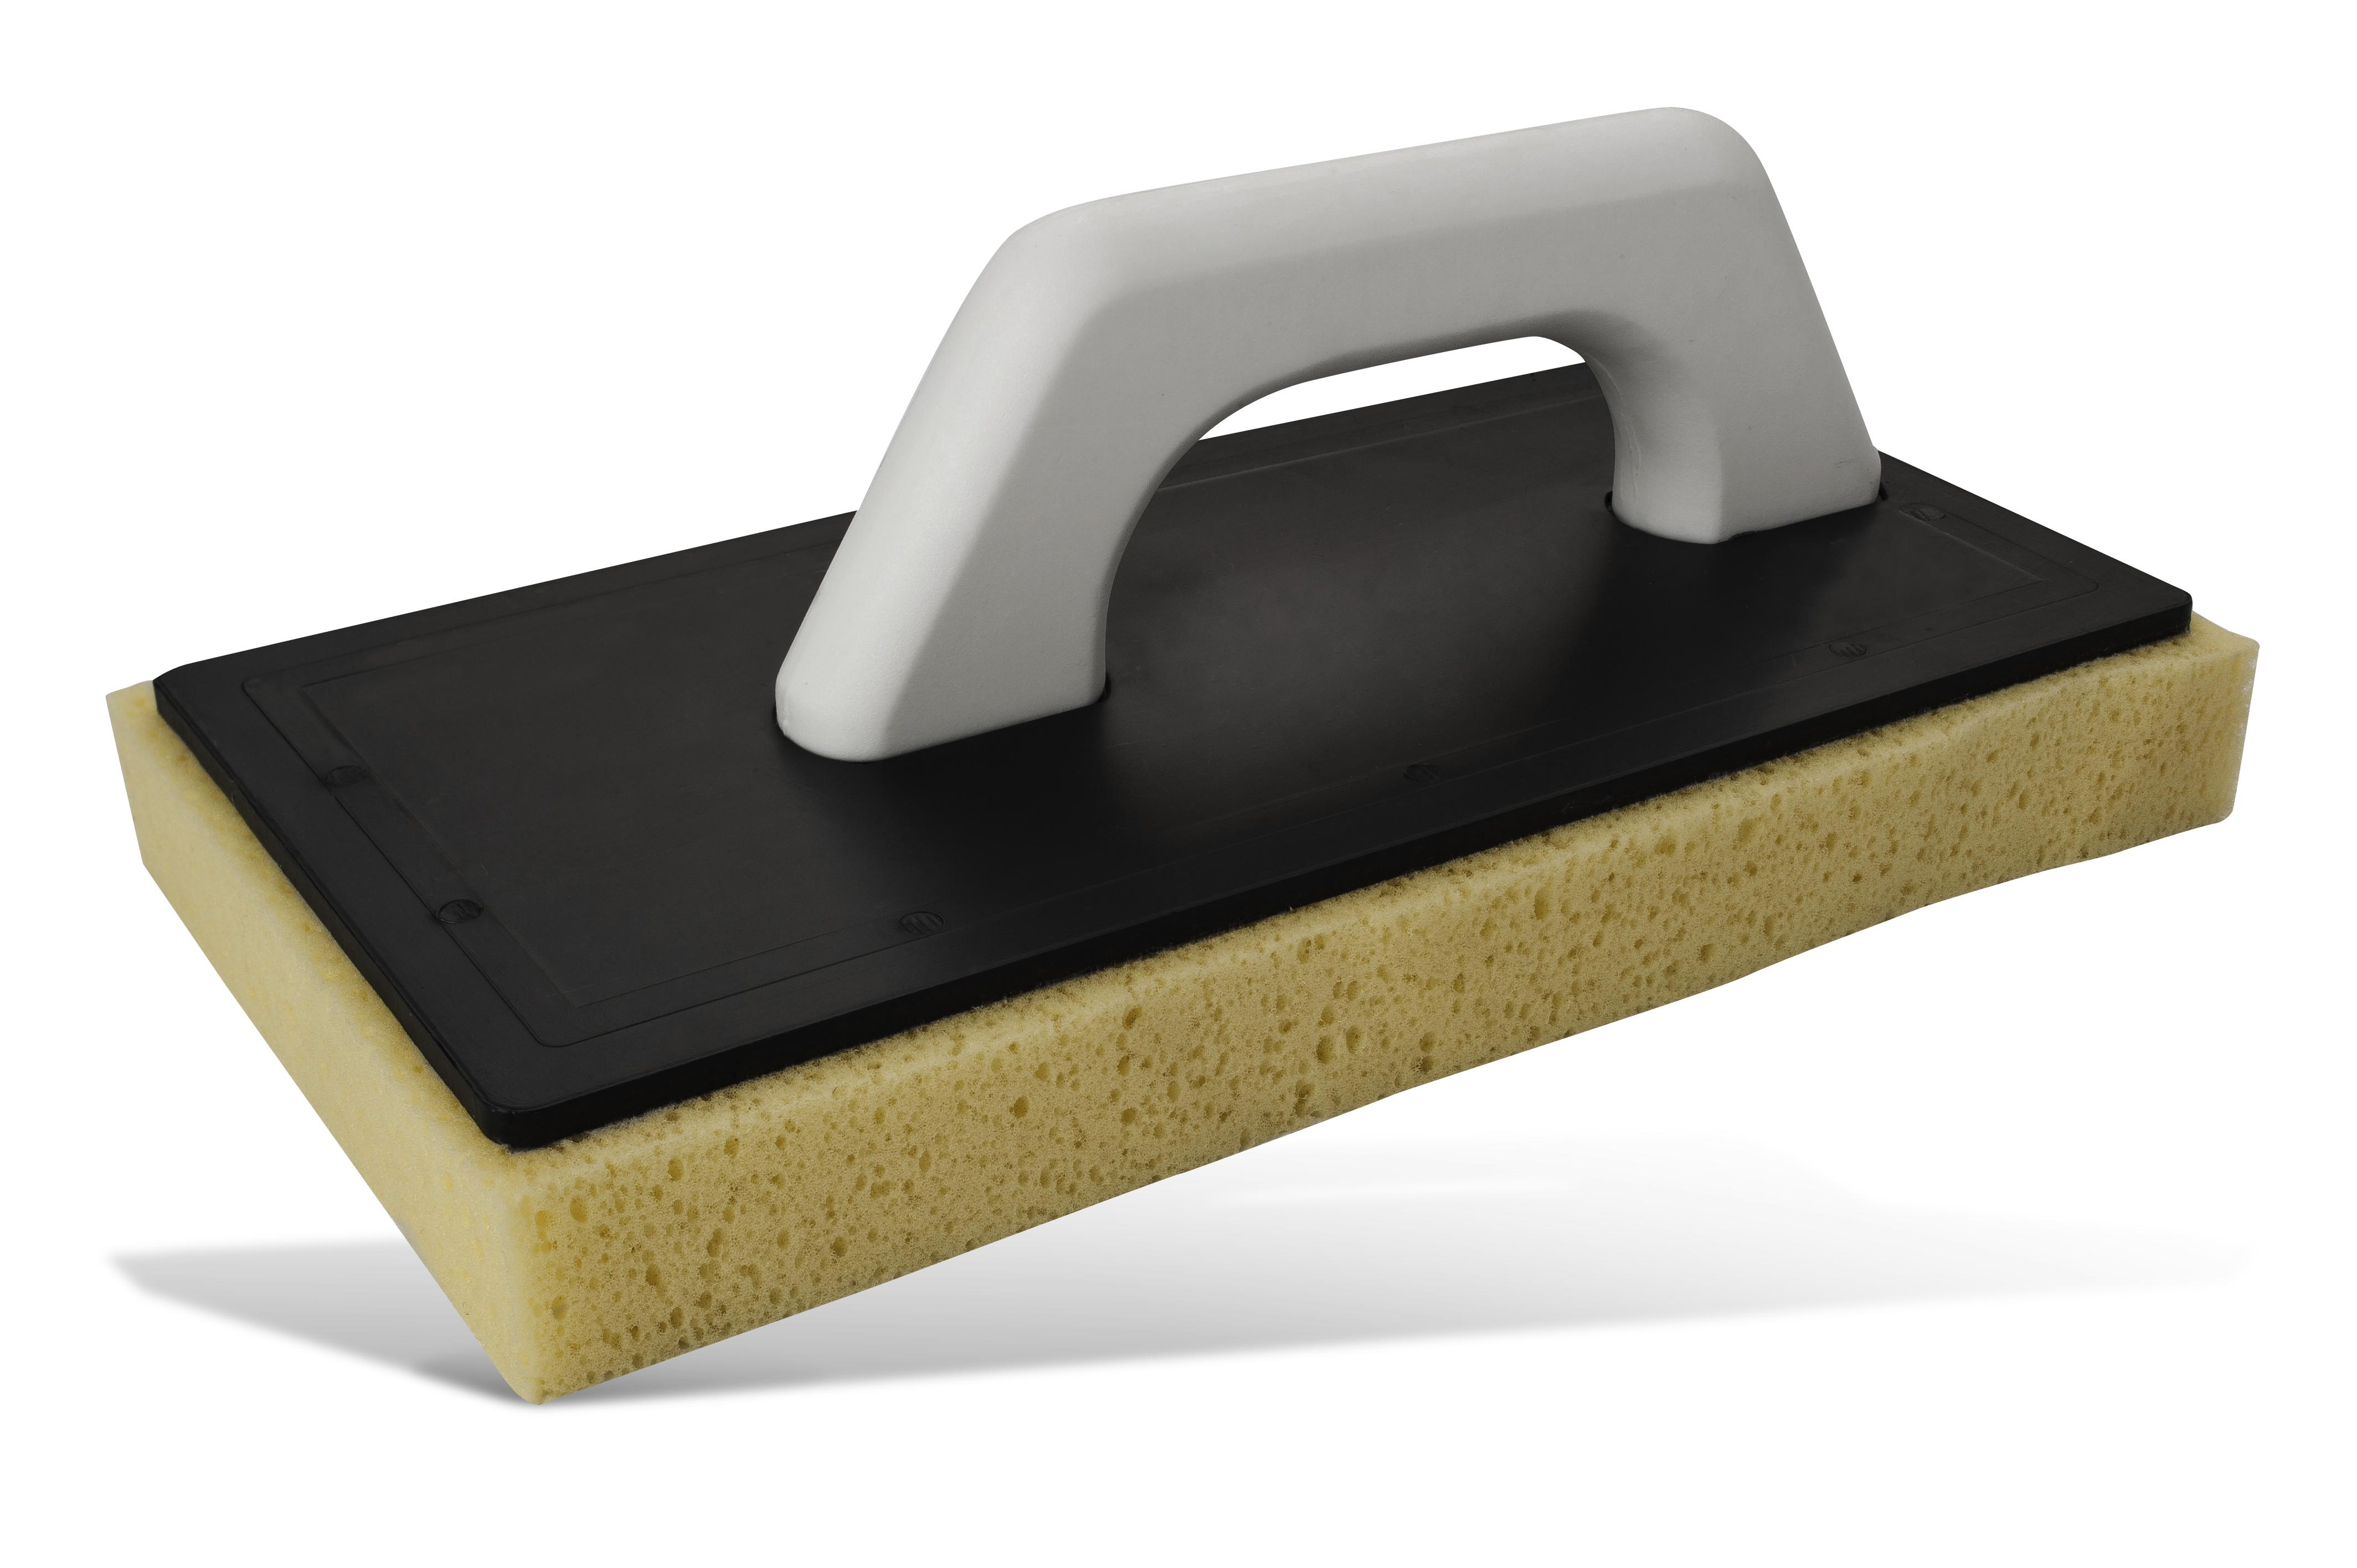 Ersatzplatte (ohne Abb.) Abwaschkelle Pajarito